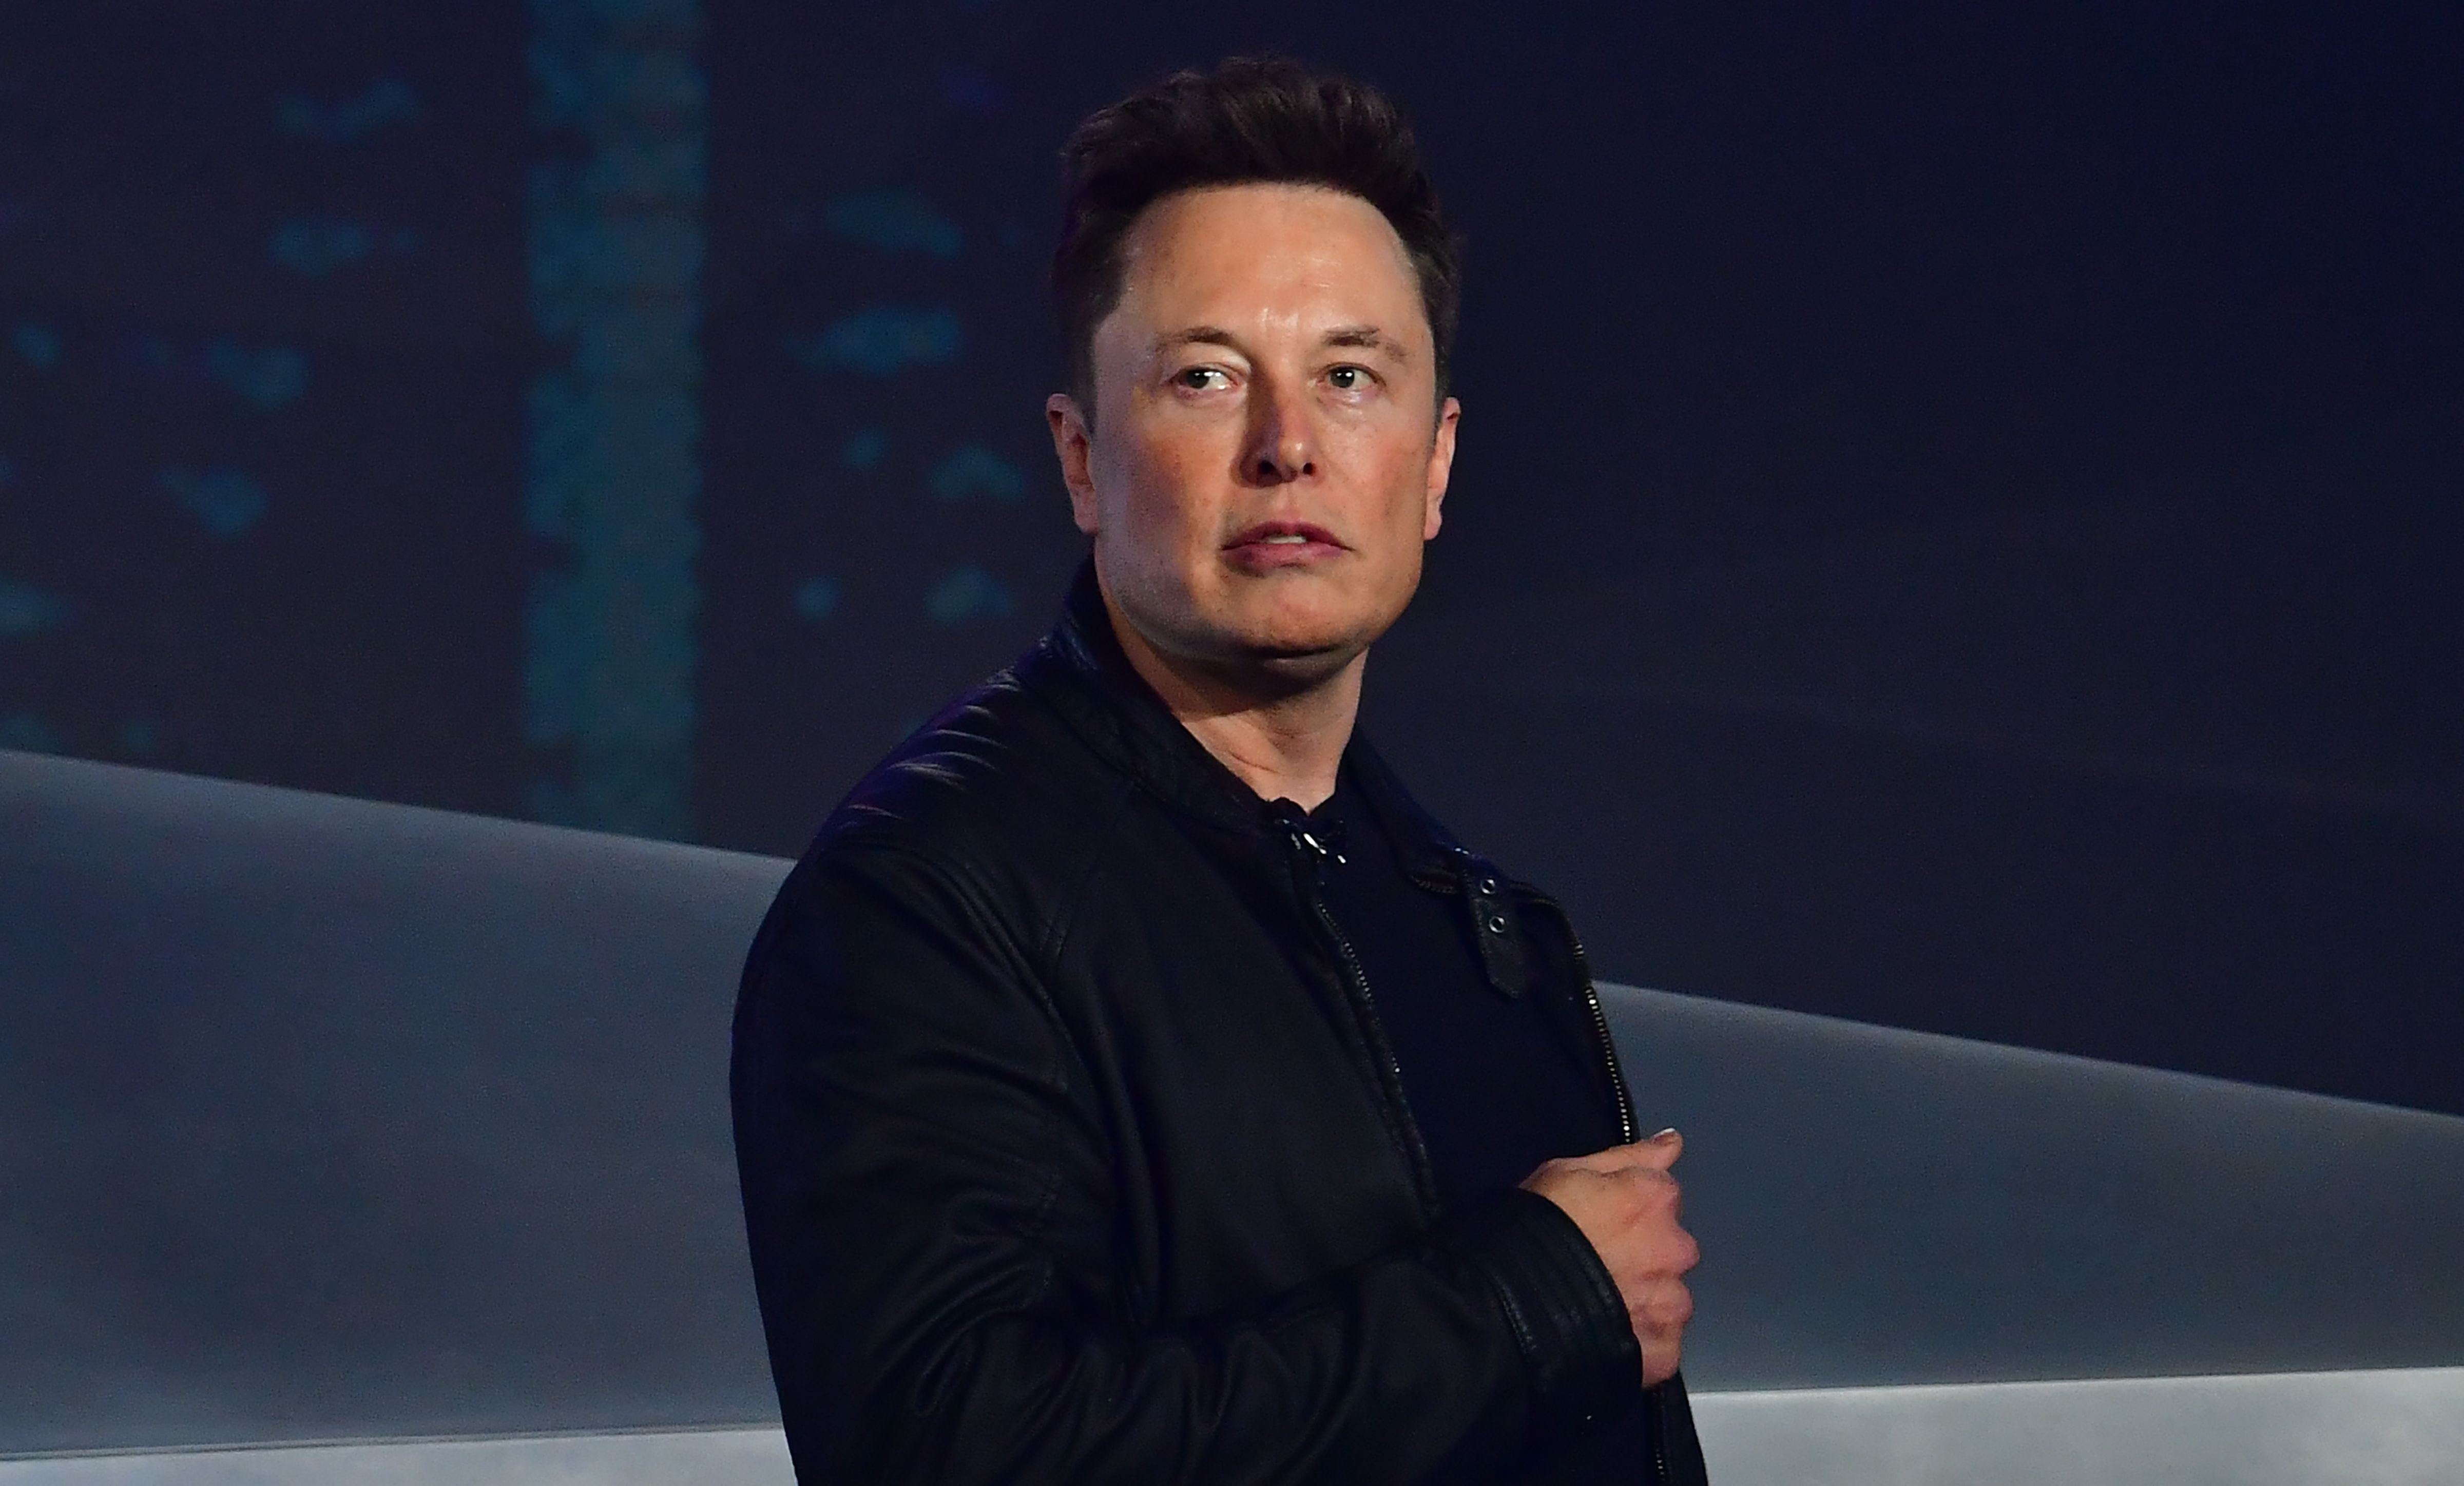 Tesla Hit By Wall Street Downgrade After 100% Rally, Leaving Musk's Bonus Uncertain